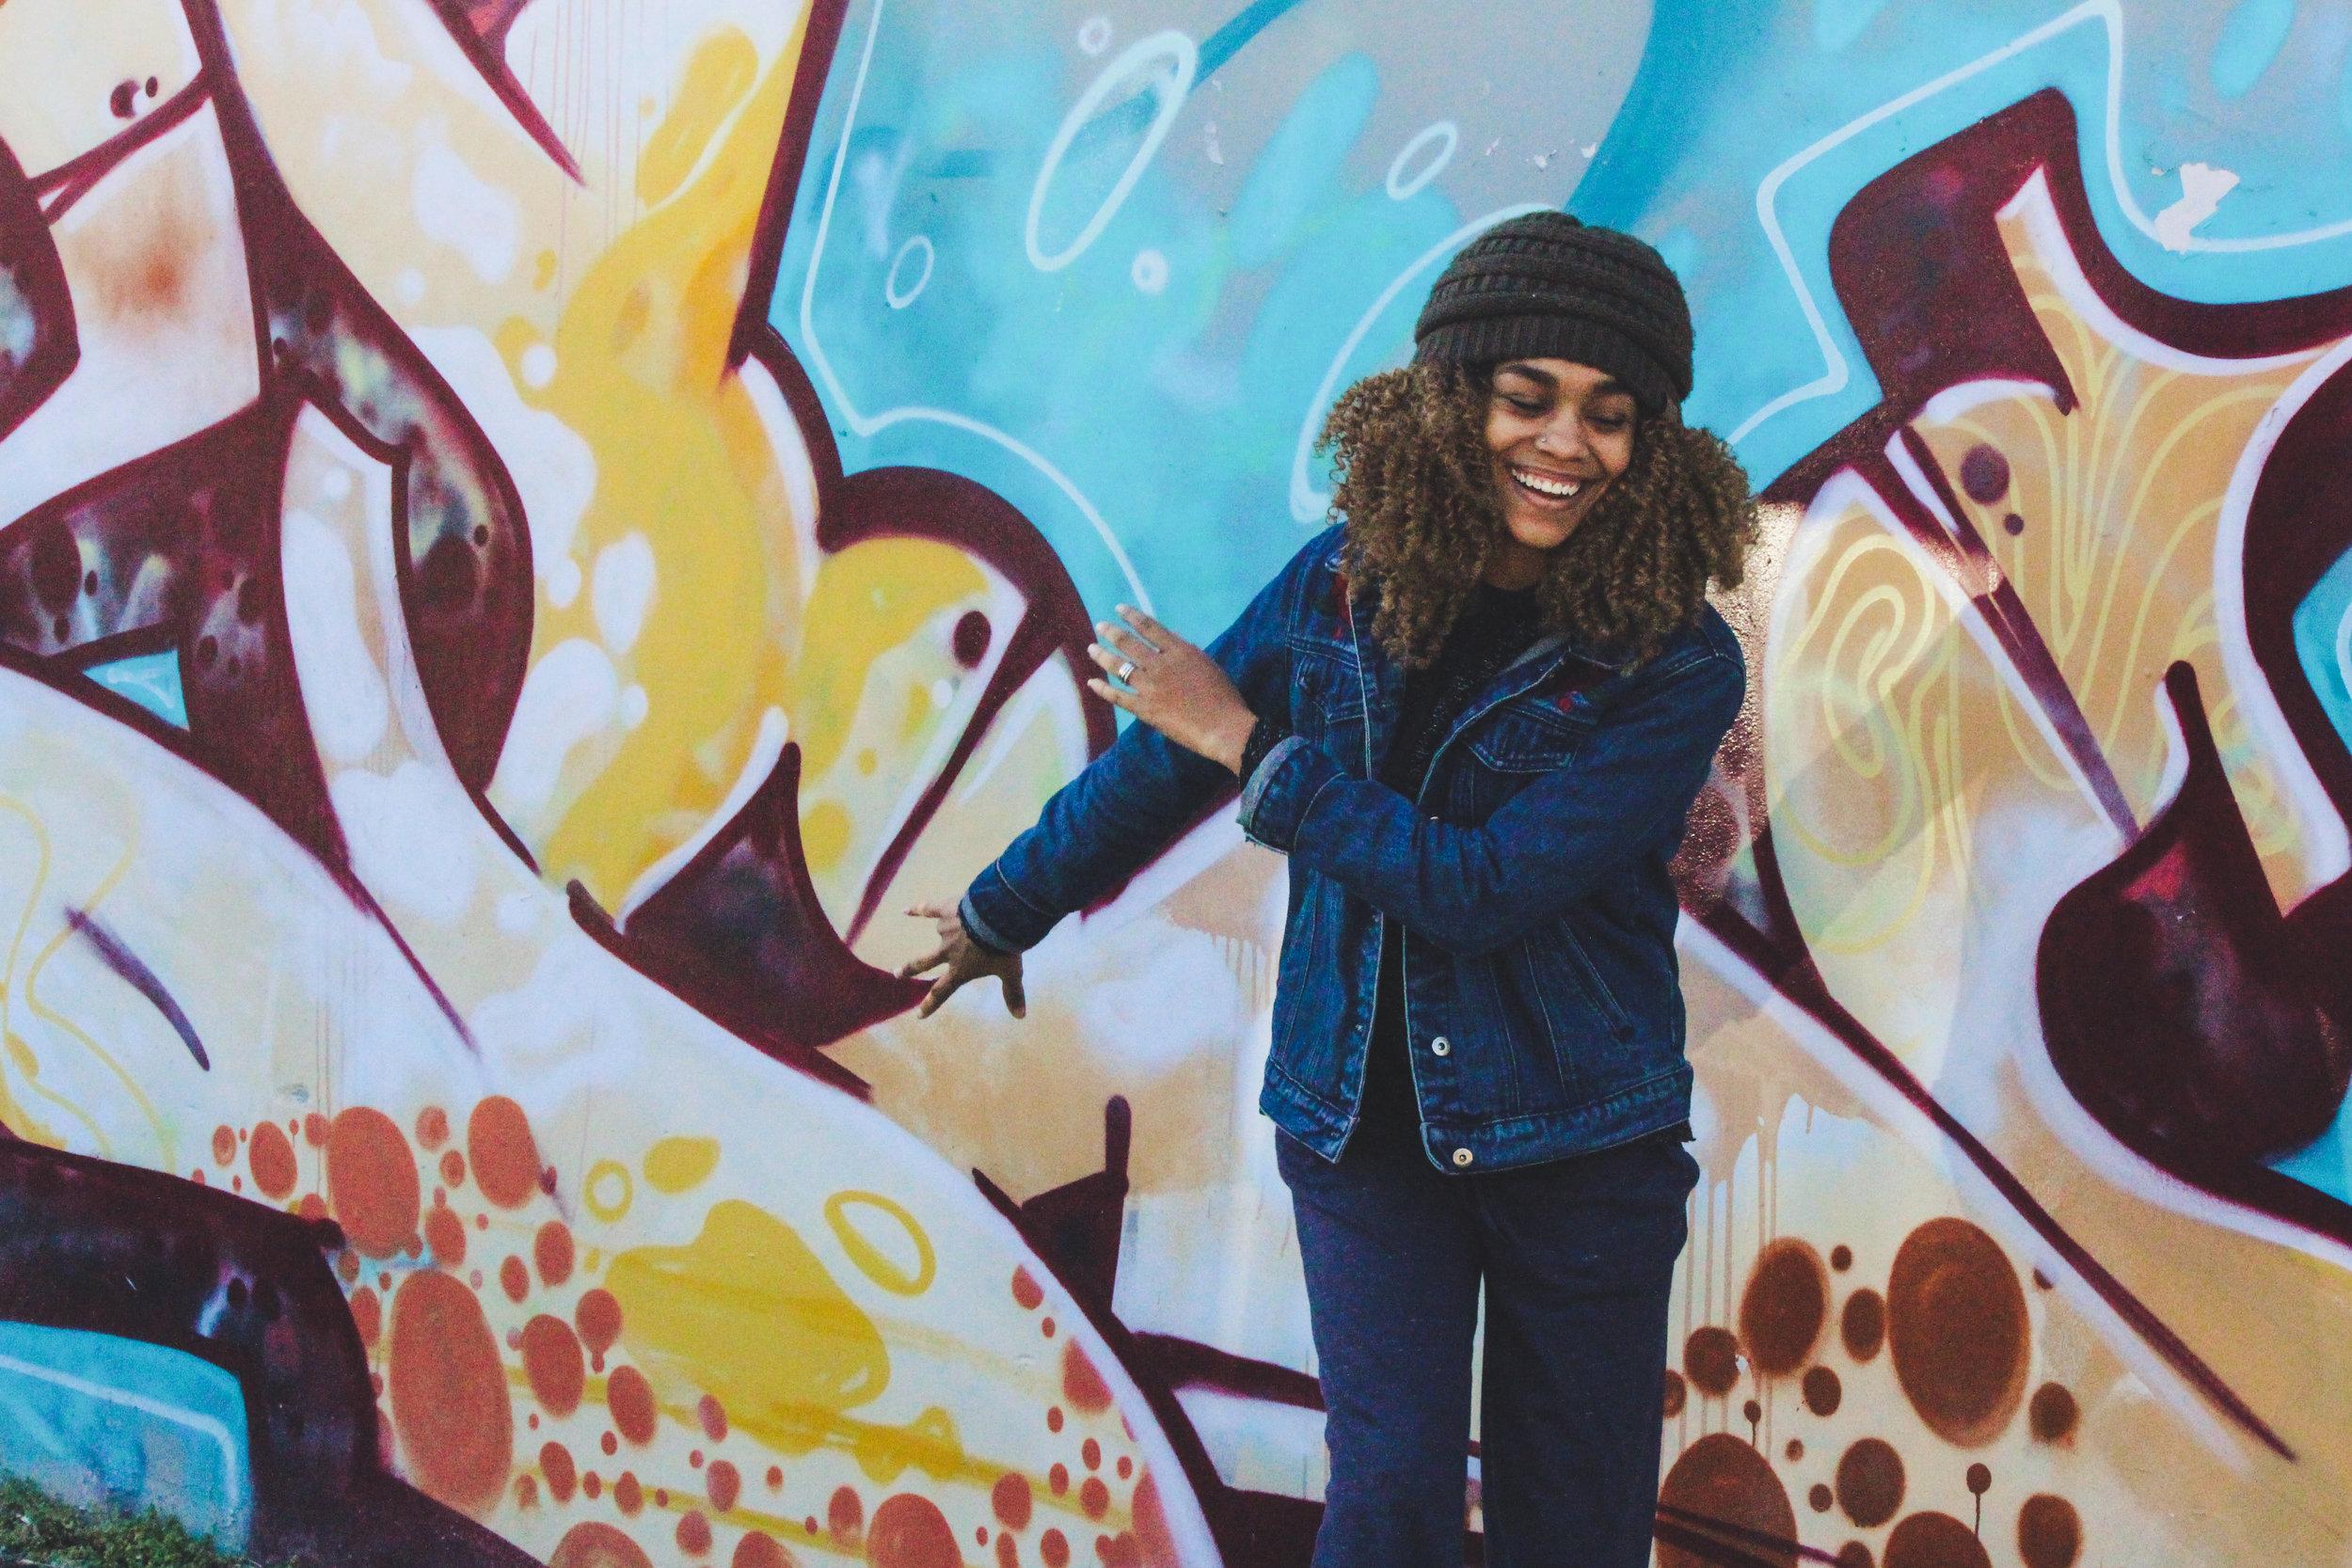 Women next to Graffitti - Unsplash - paulette-wooten-223048.jpg